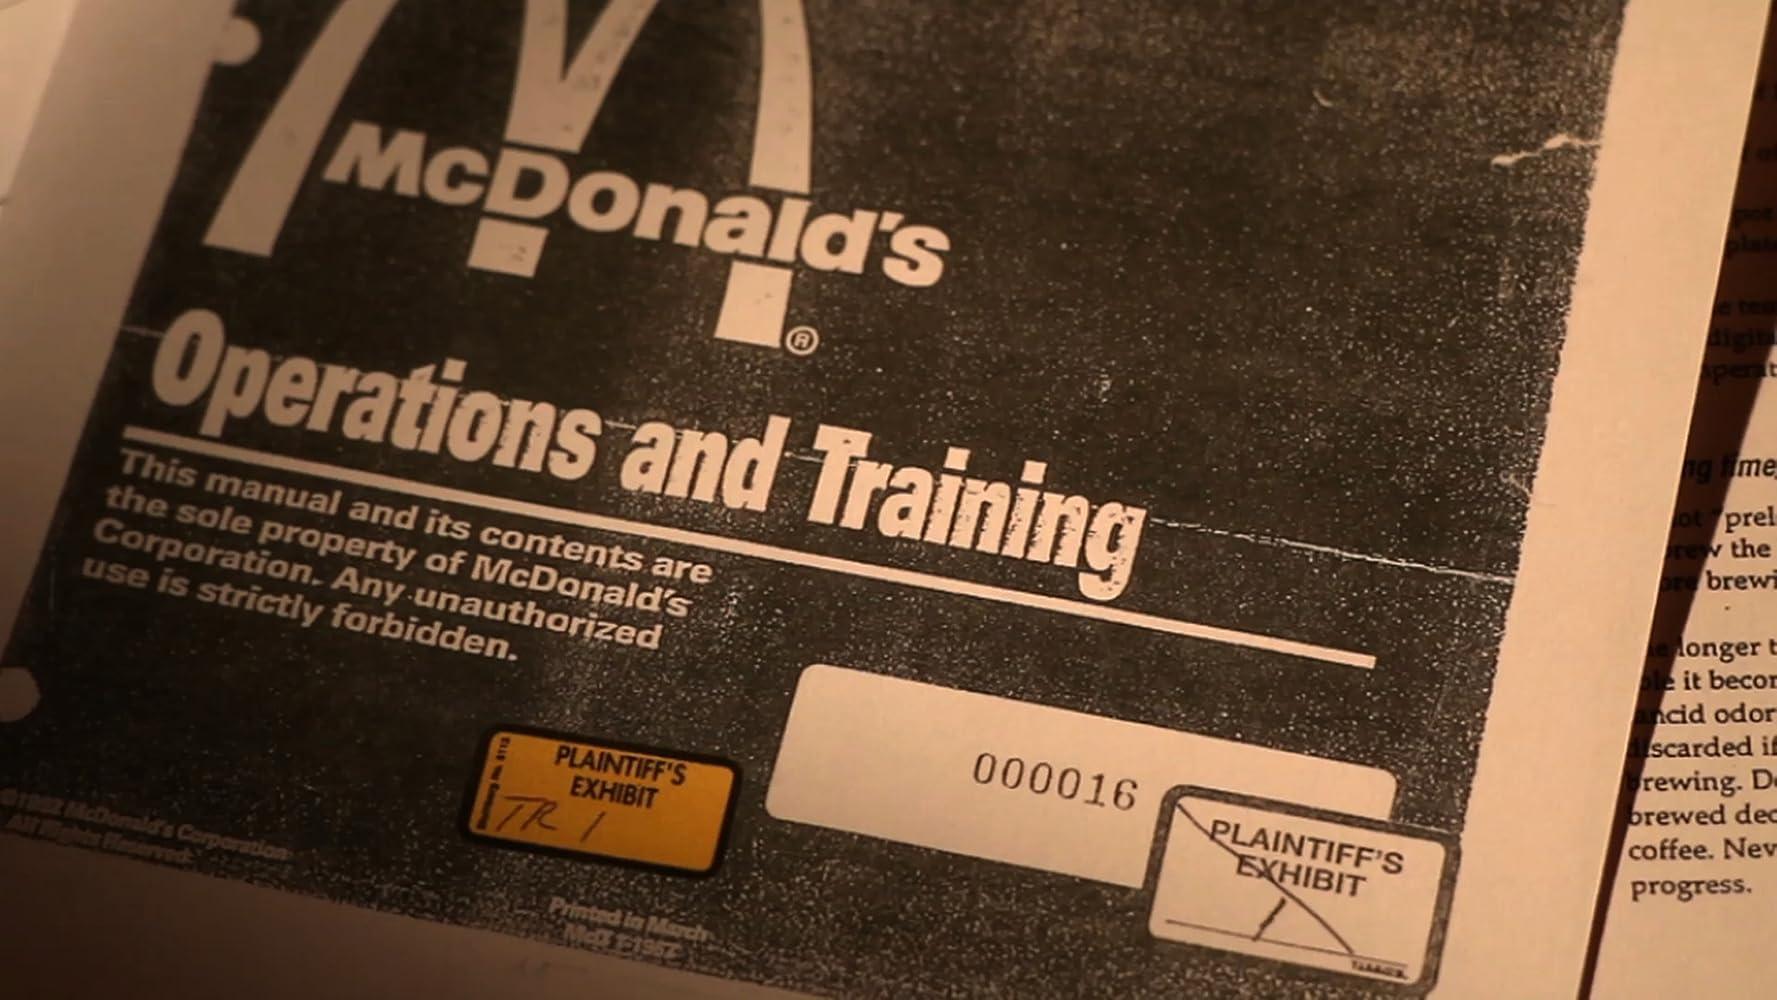 hot coffee 2011 rh imdb com mcdonald's training manual pdf mcdonald's training manual